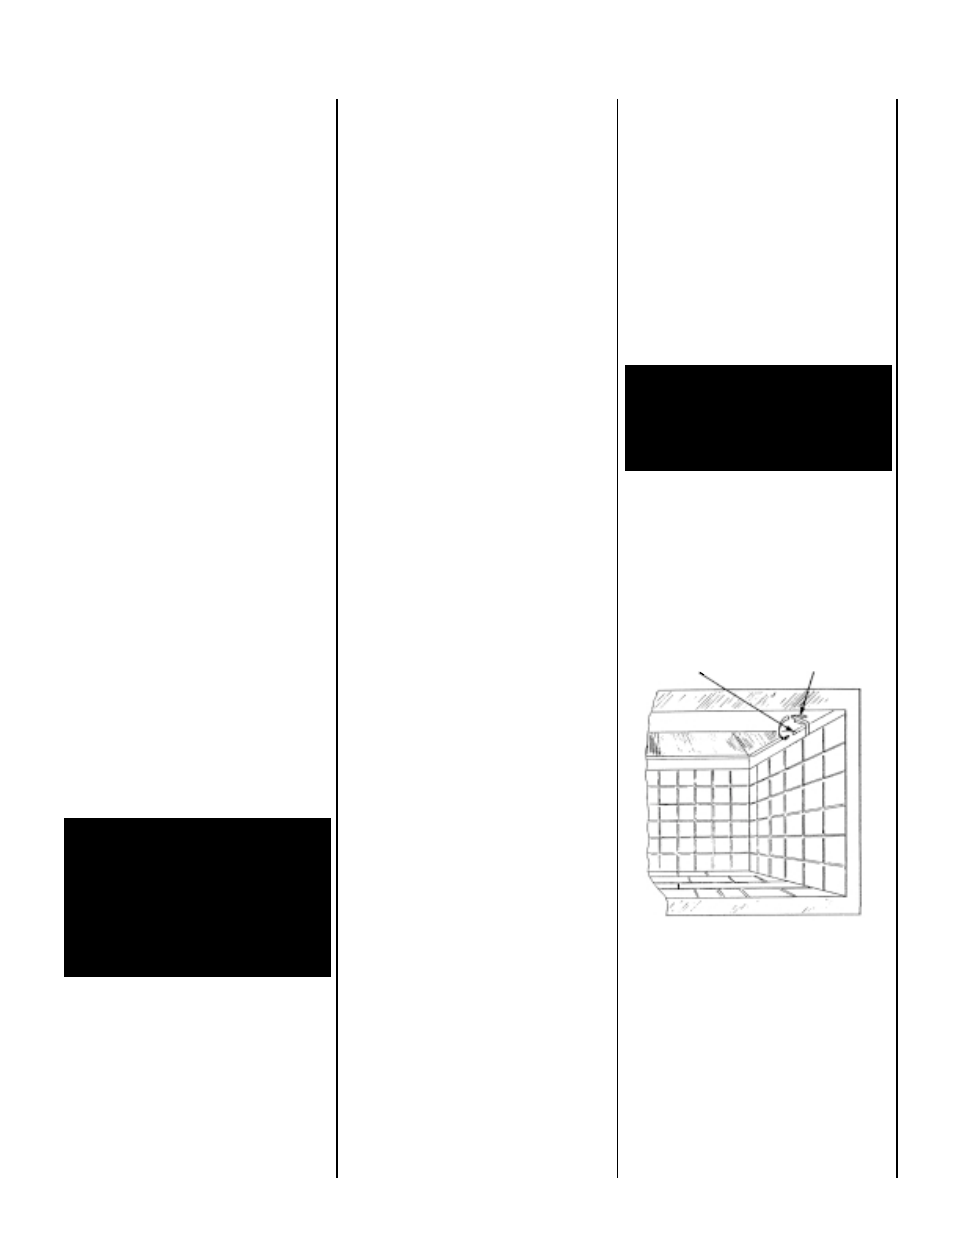 lennox hearth elite la41tcf user manual page 5 8 original mode rh manualsdir com lennox ms8 user manual lennox yt1ff user manual